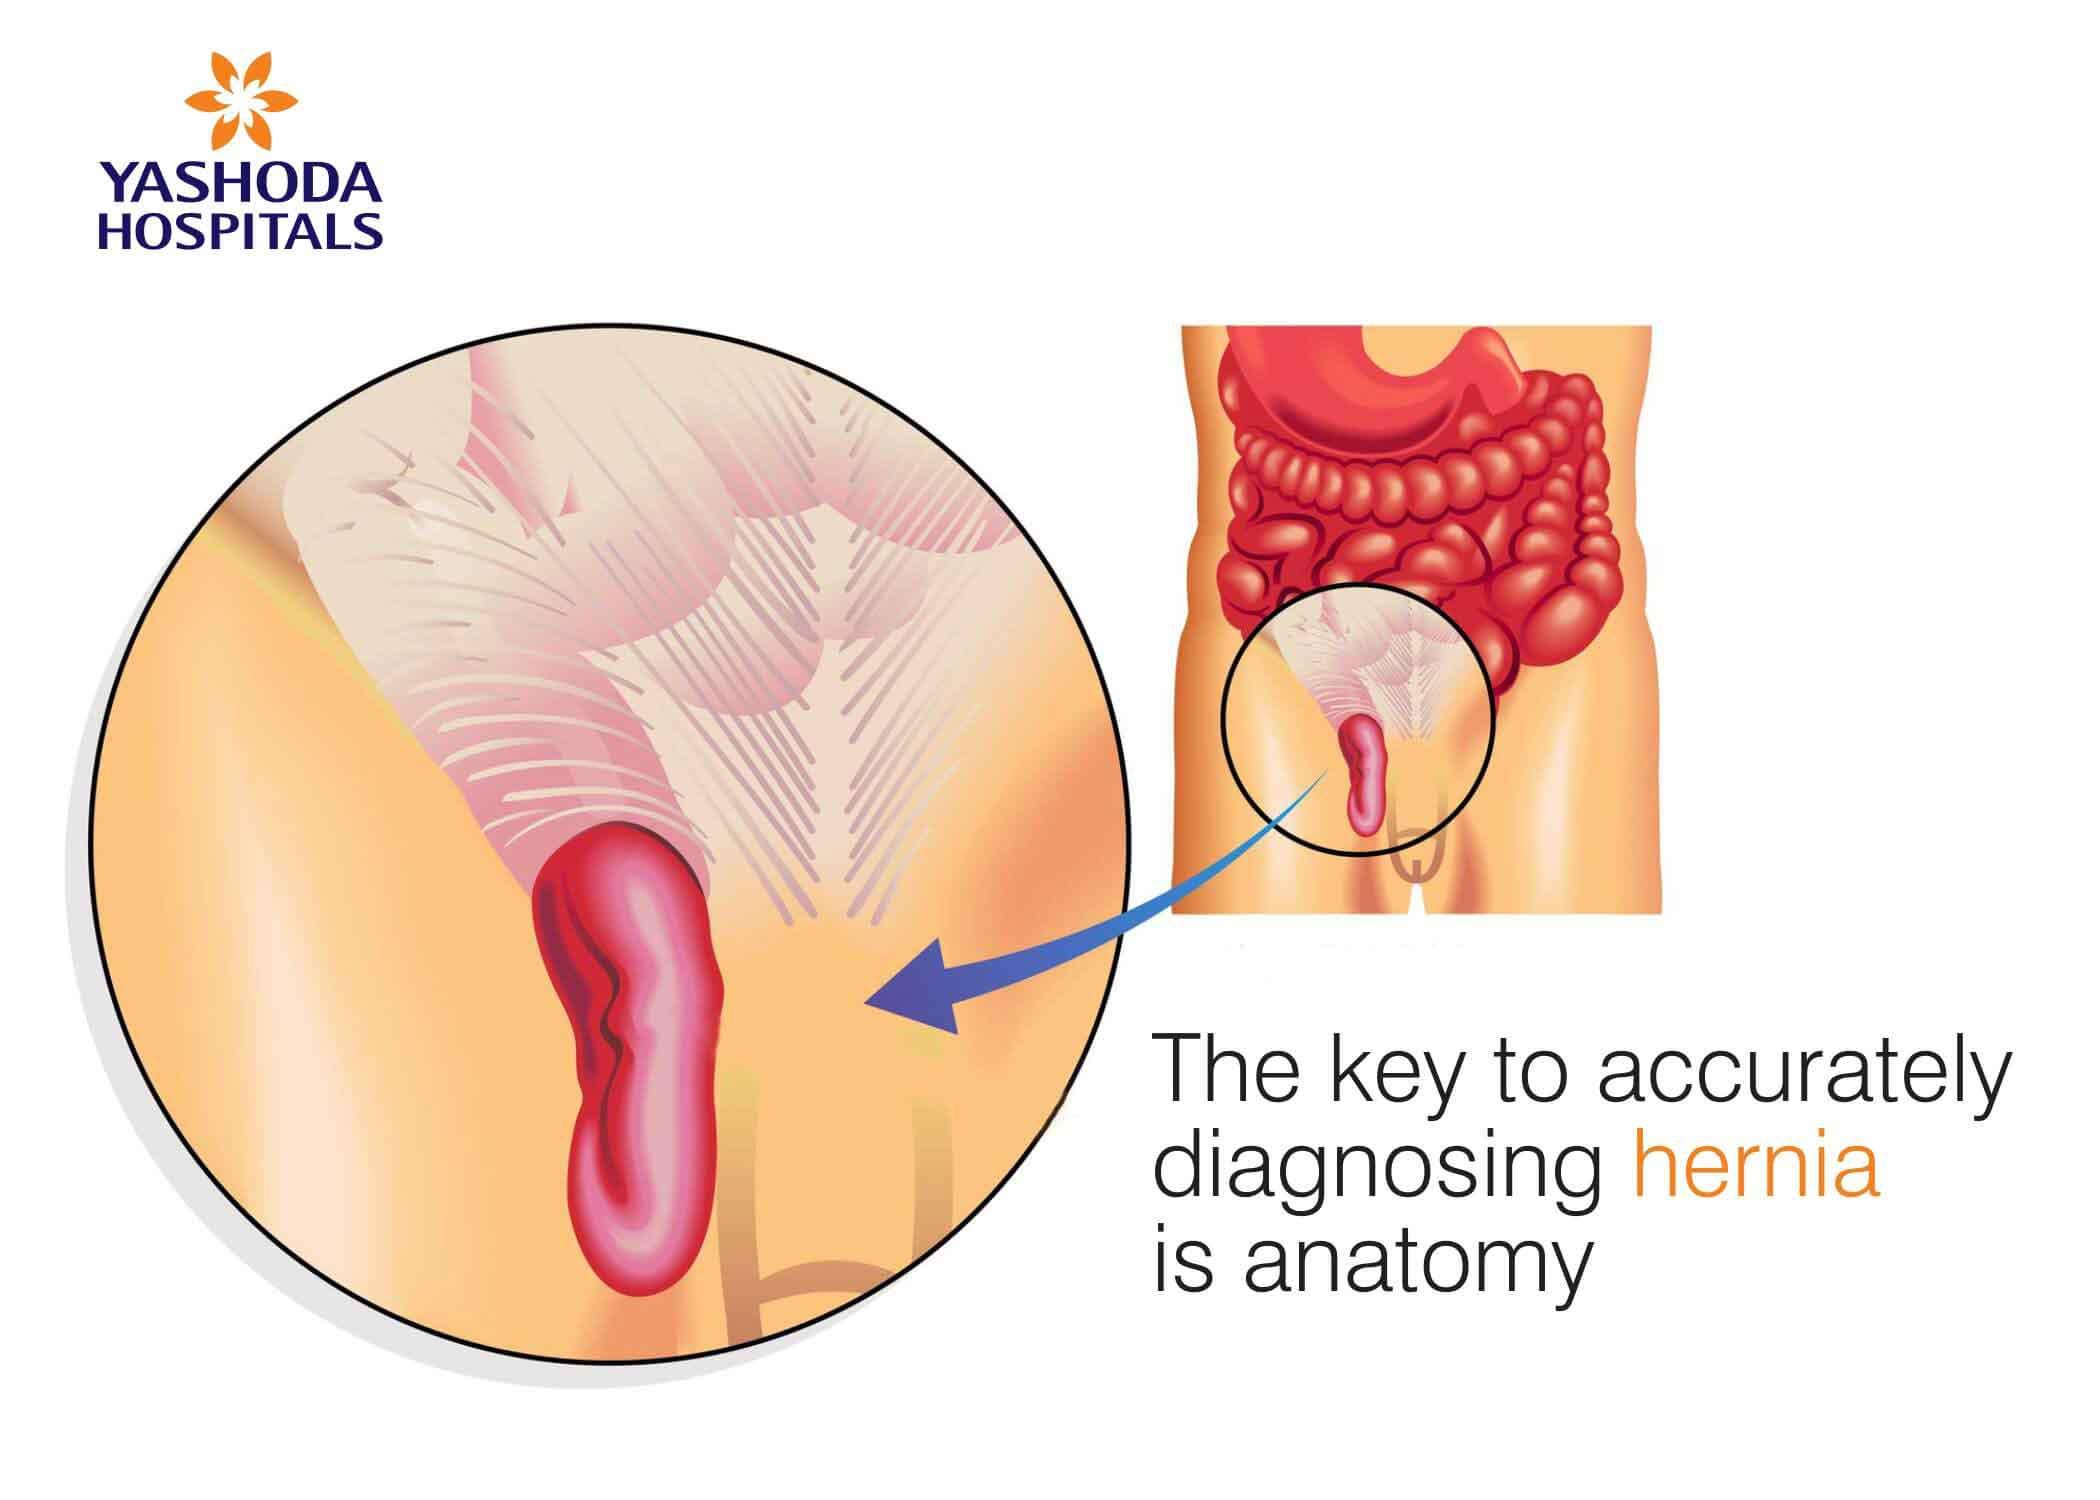 diagnosing hernia